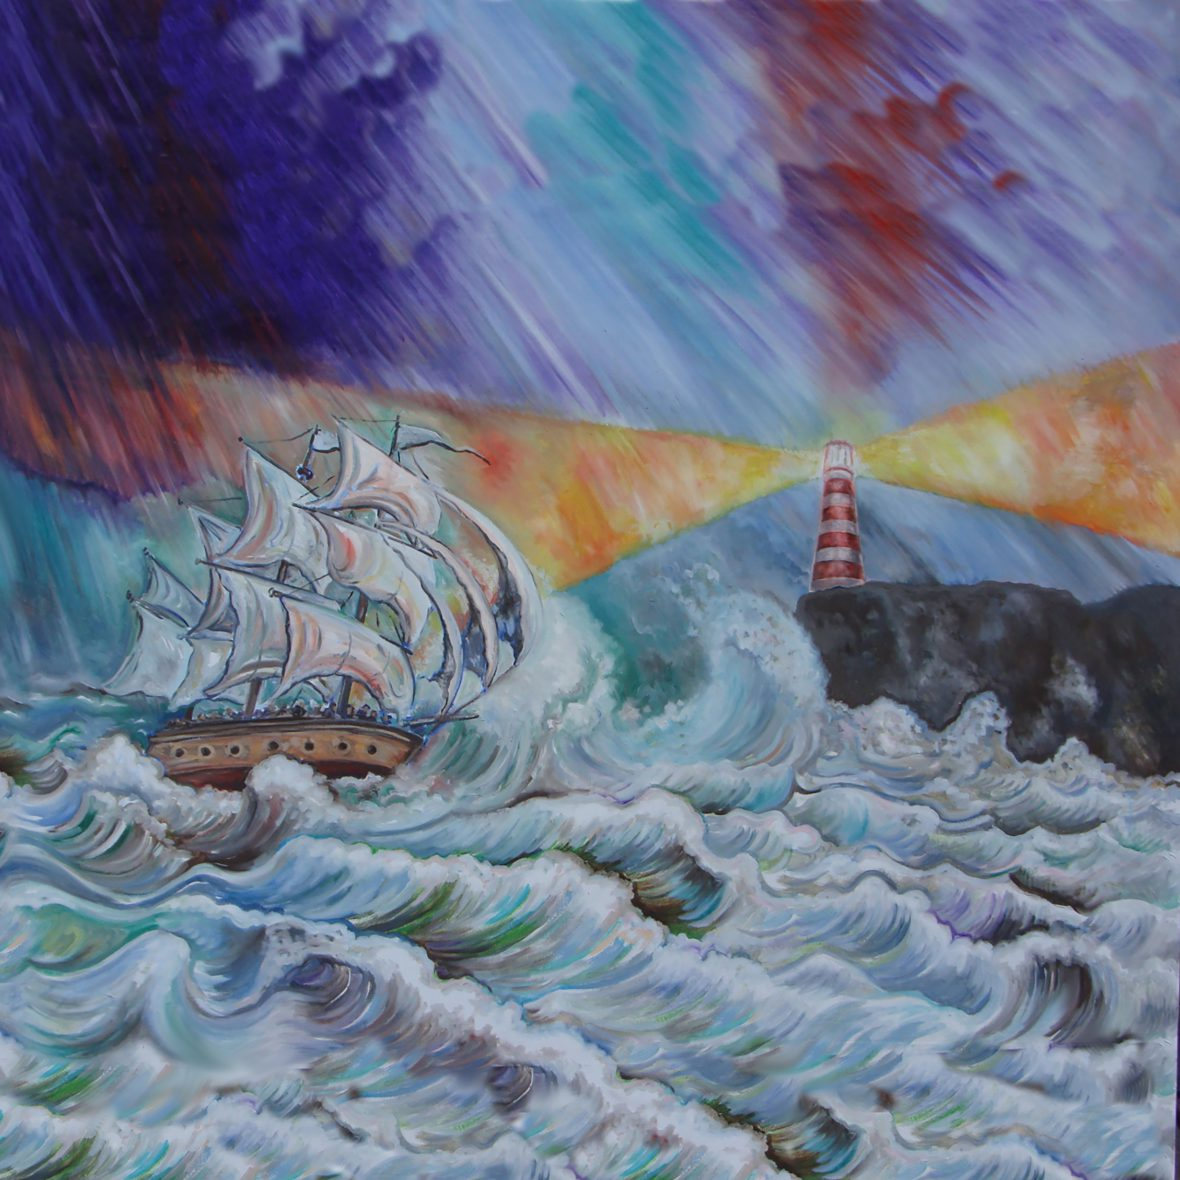 Hark! The Headland Approacheth by Seas Of Mirth